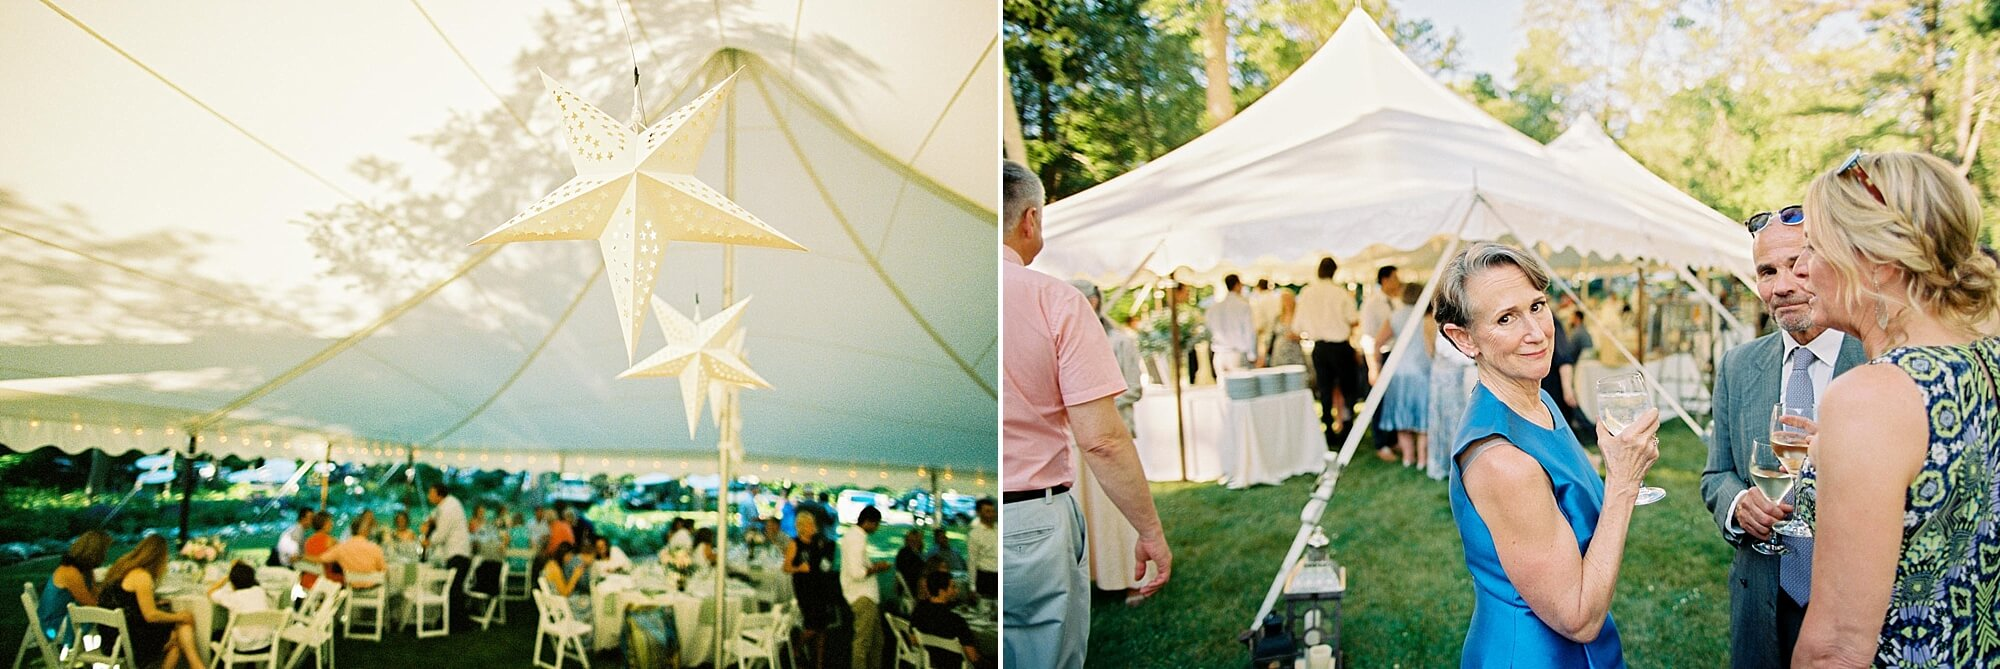 Backyard Wedding - MA_0072.jpg